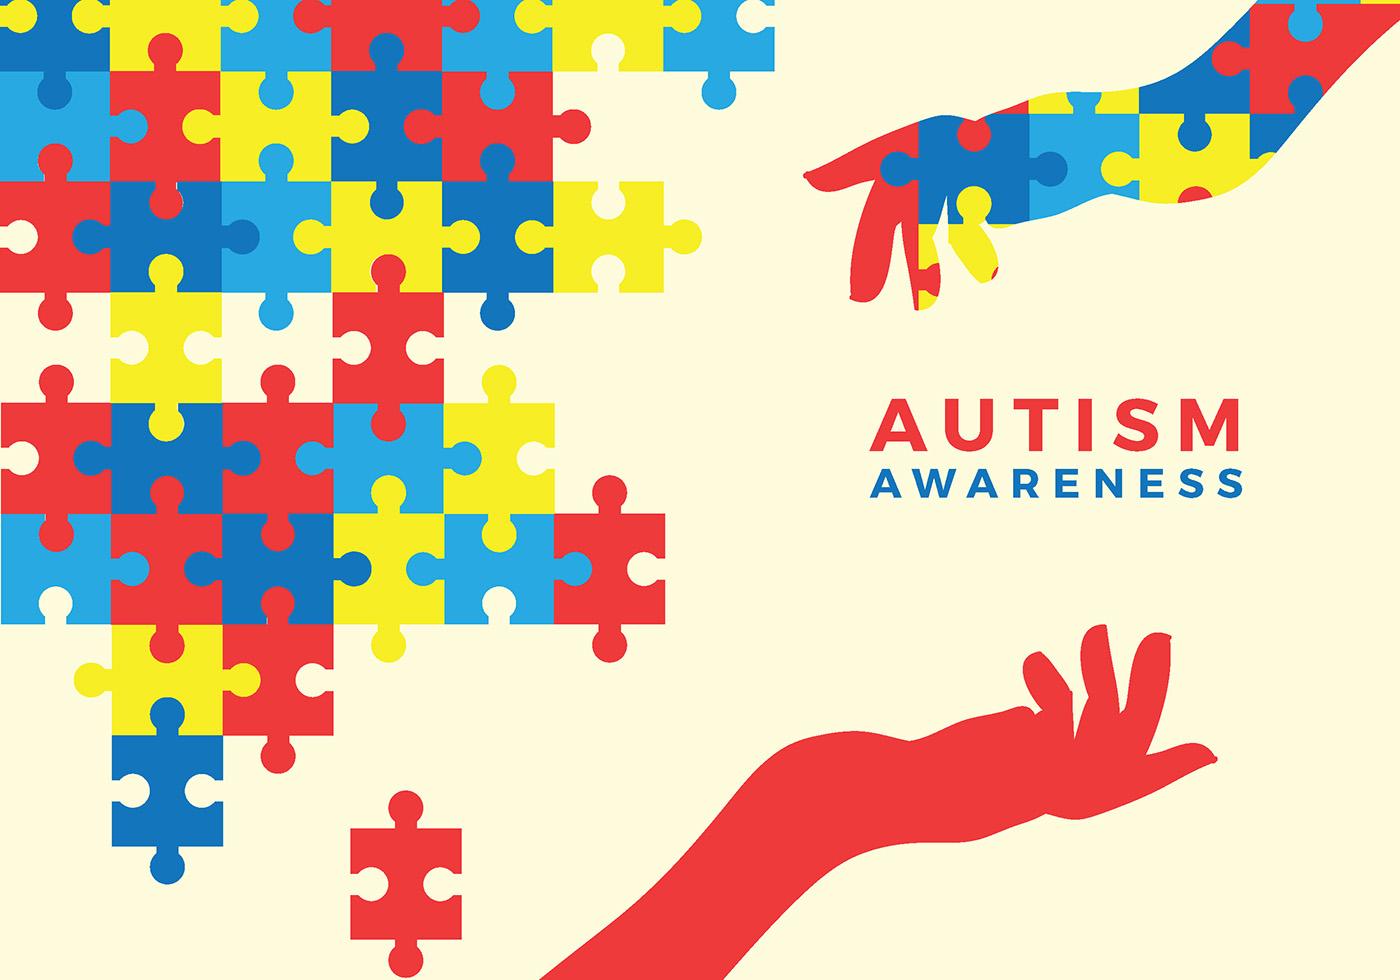 autism-awarness-free-vector.jpg